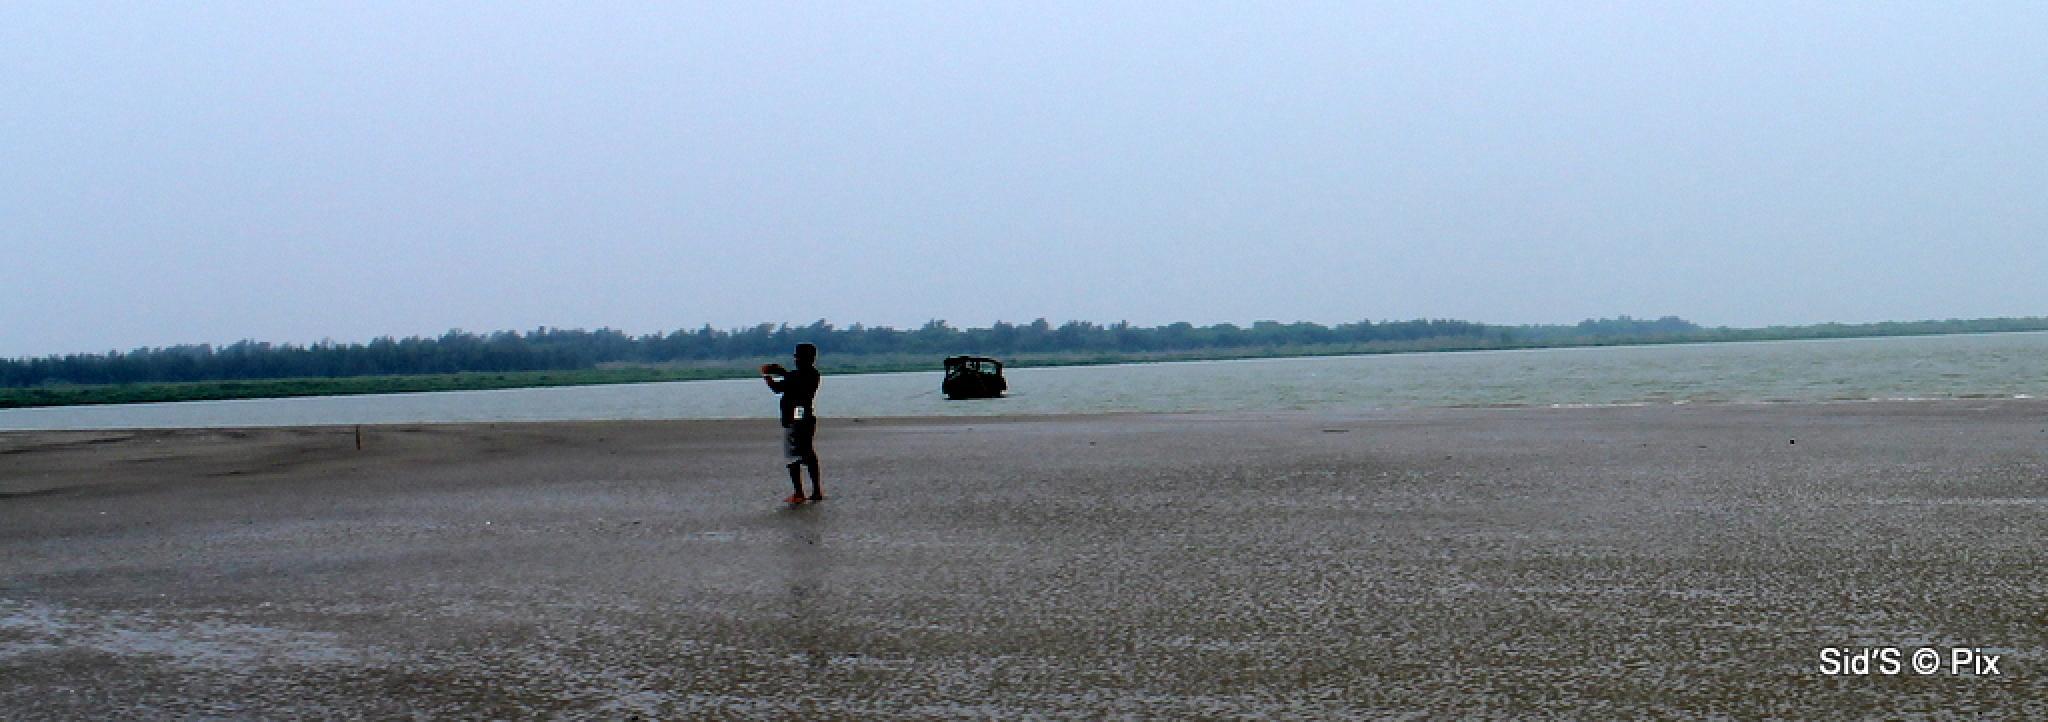 Man on a Sand Bar by Siddharth Sanyal